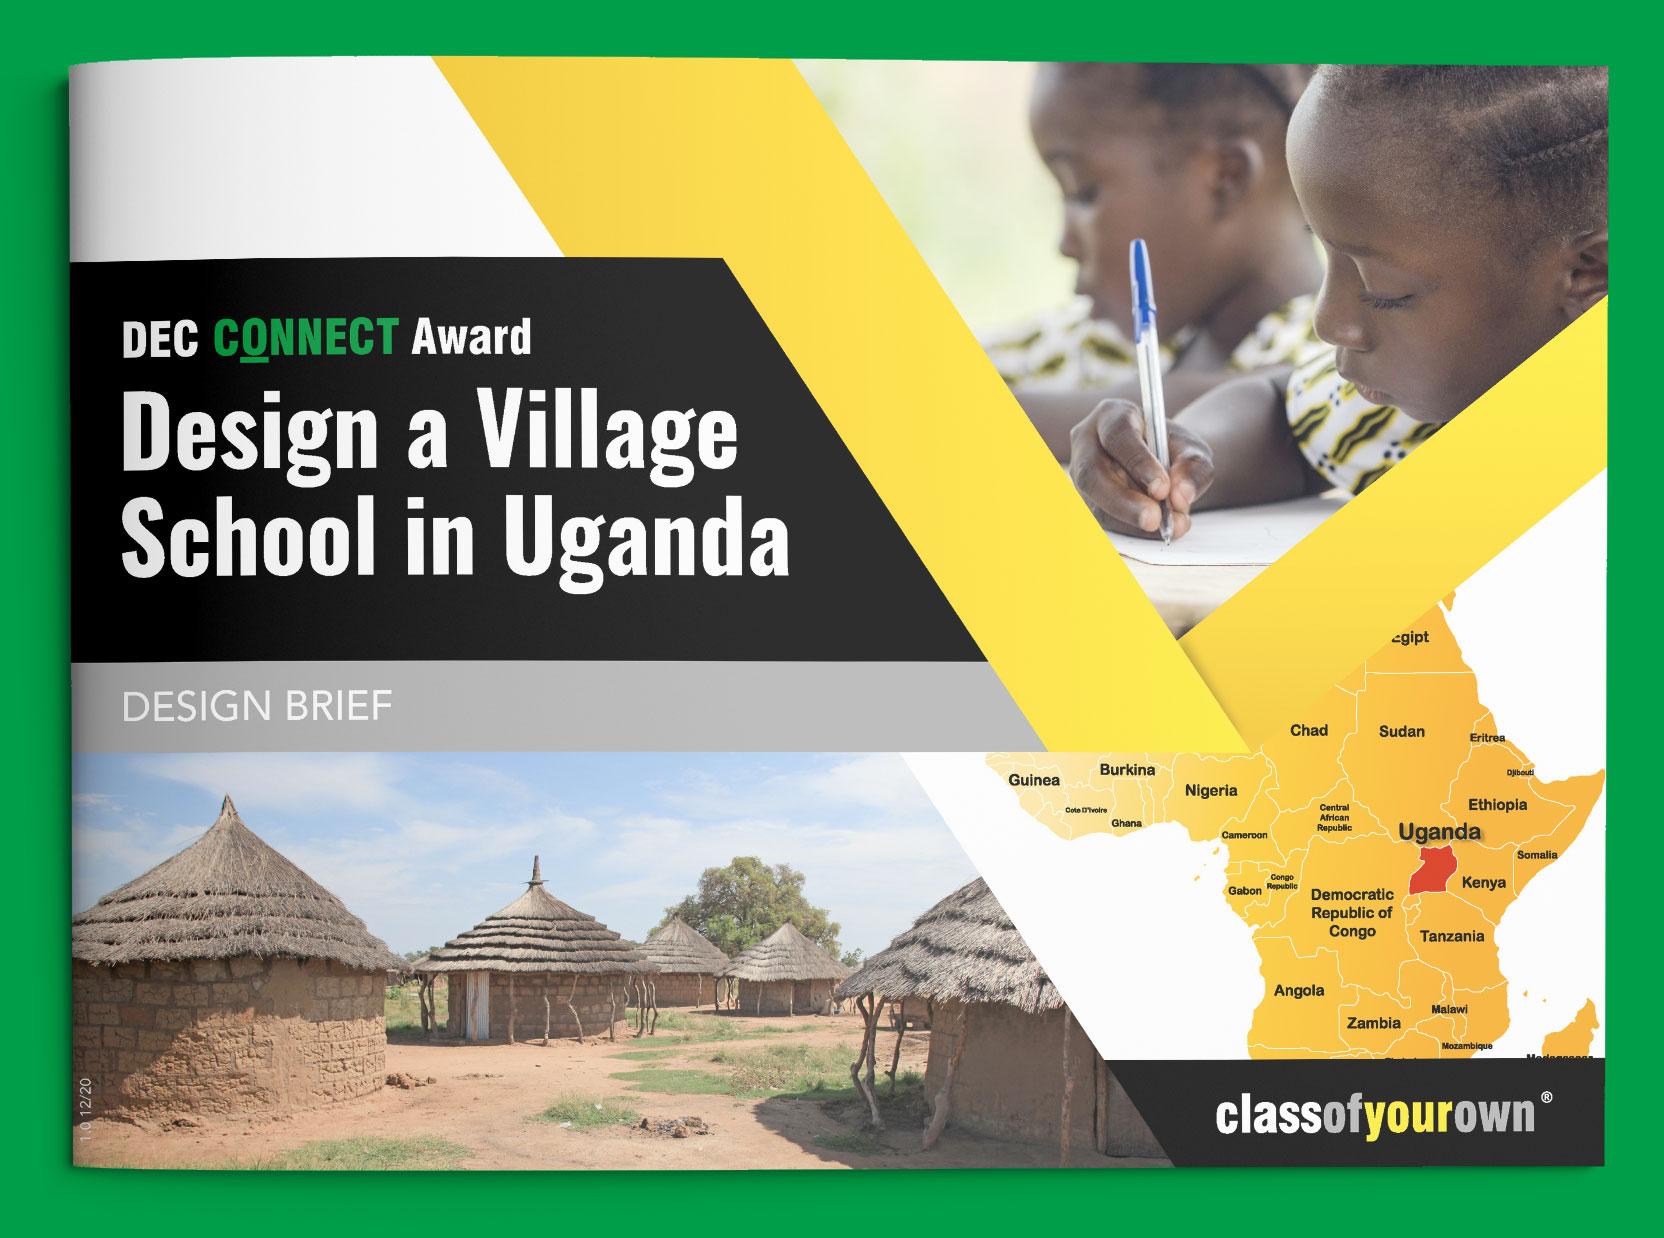 COYO Work Experience - Design a Village School in Uganda